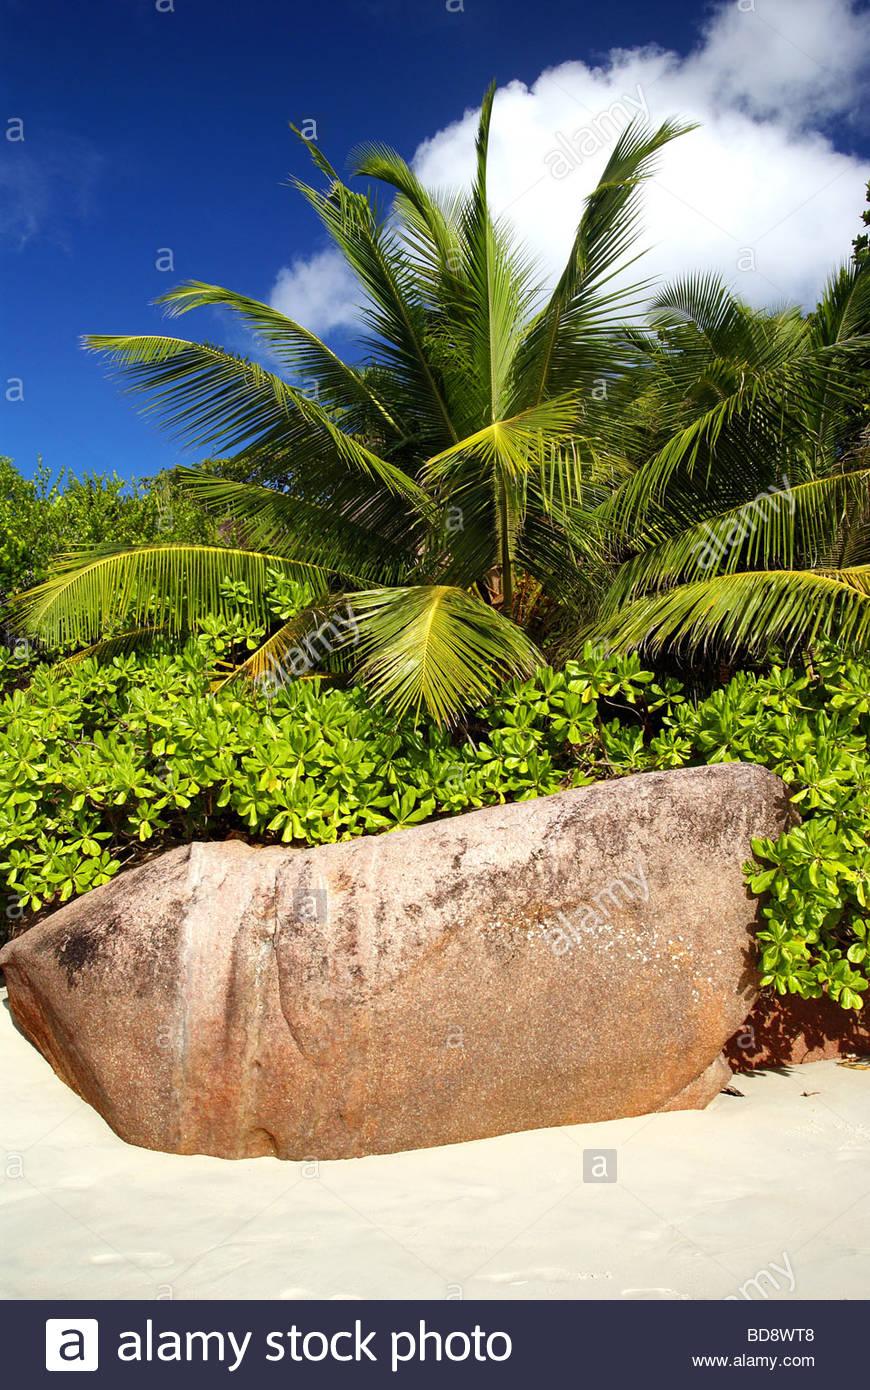 Boulder on the beach - Seychelles - Stock Image